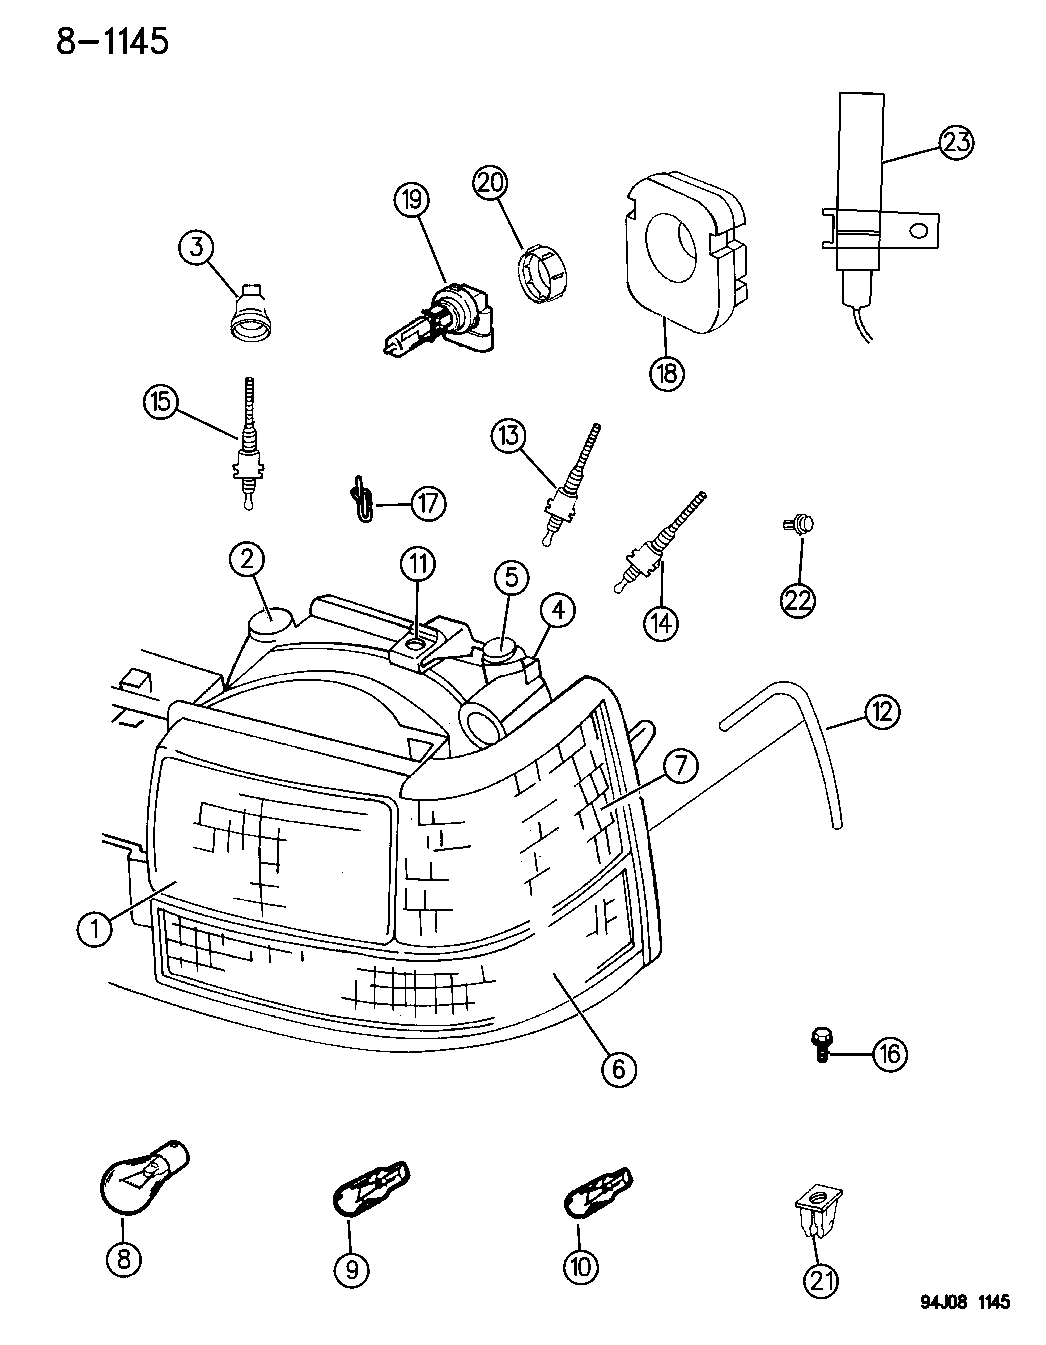 Resource T D Amp S L Amp R Ab C Ee C F E E E Adfb B C Eb Be F Bb F on 89 Jeep Cherokee Engine Diagram